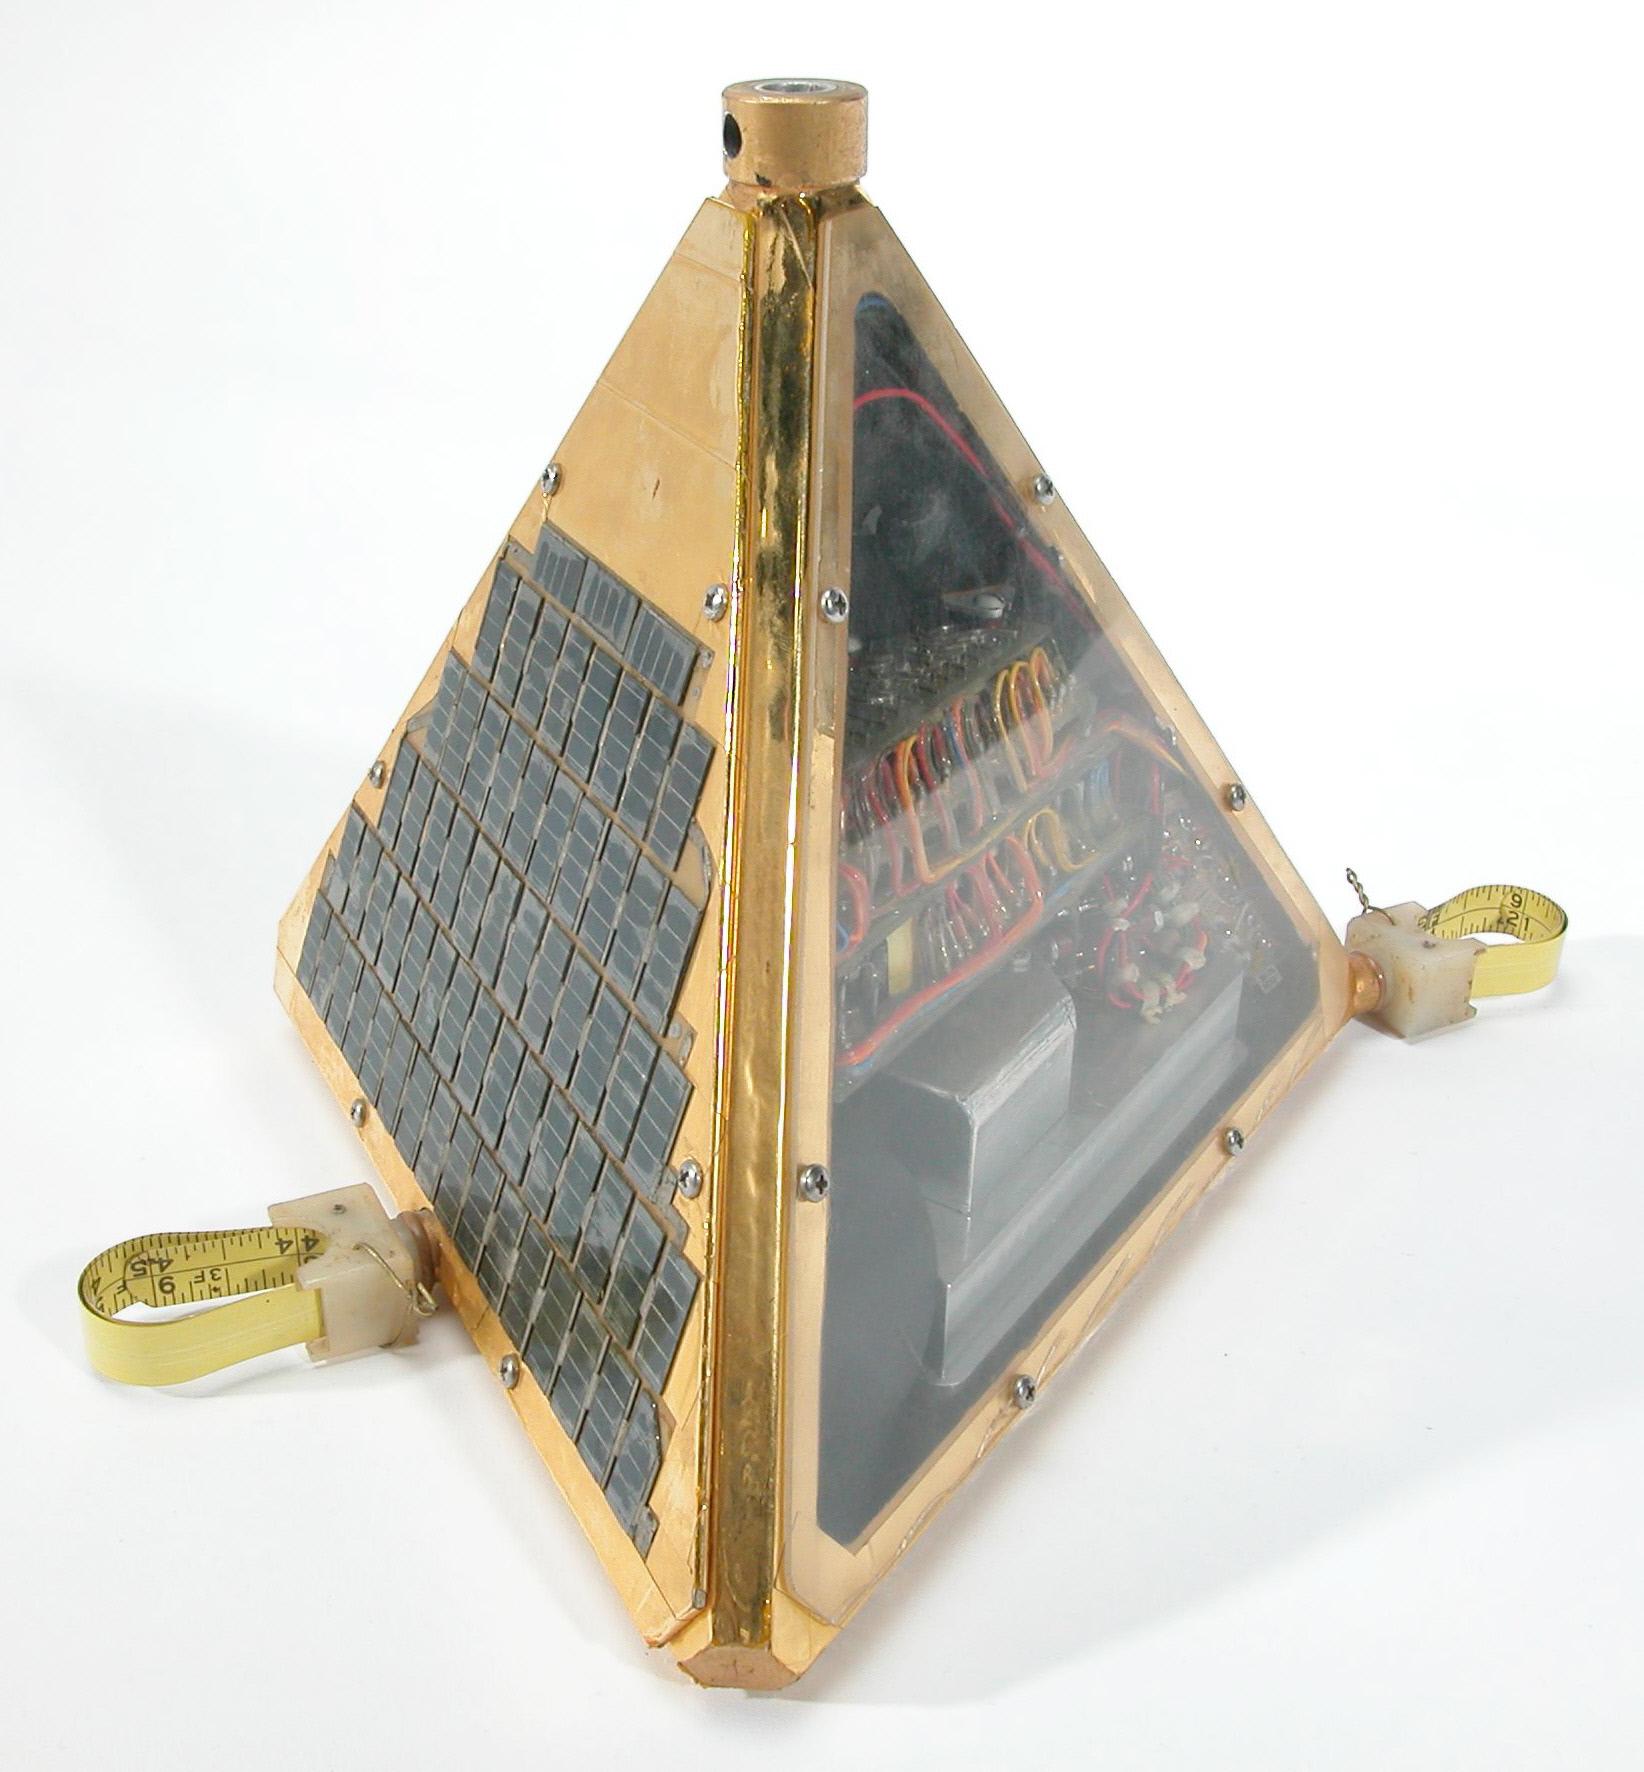 Image of : Satellite, TRS II, Prototype